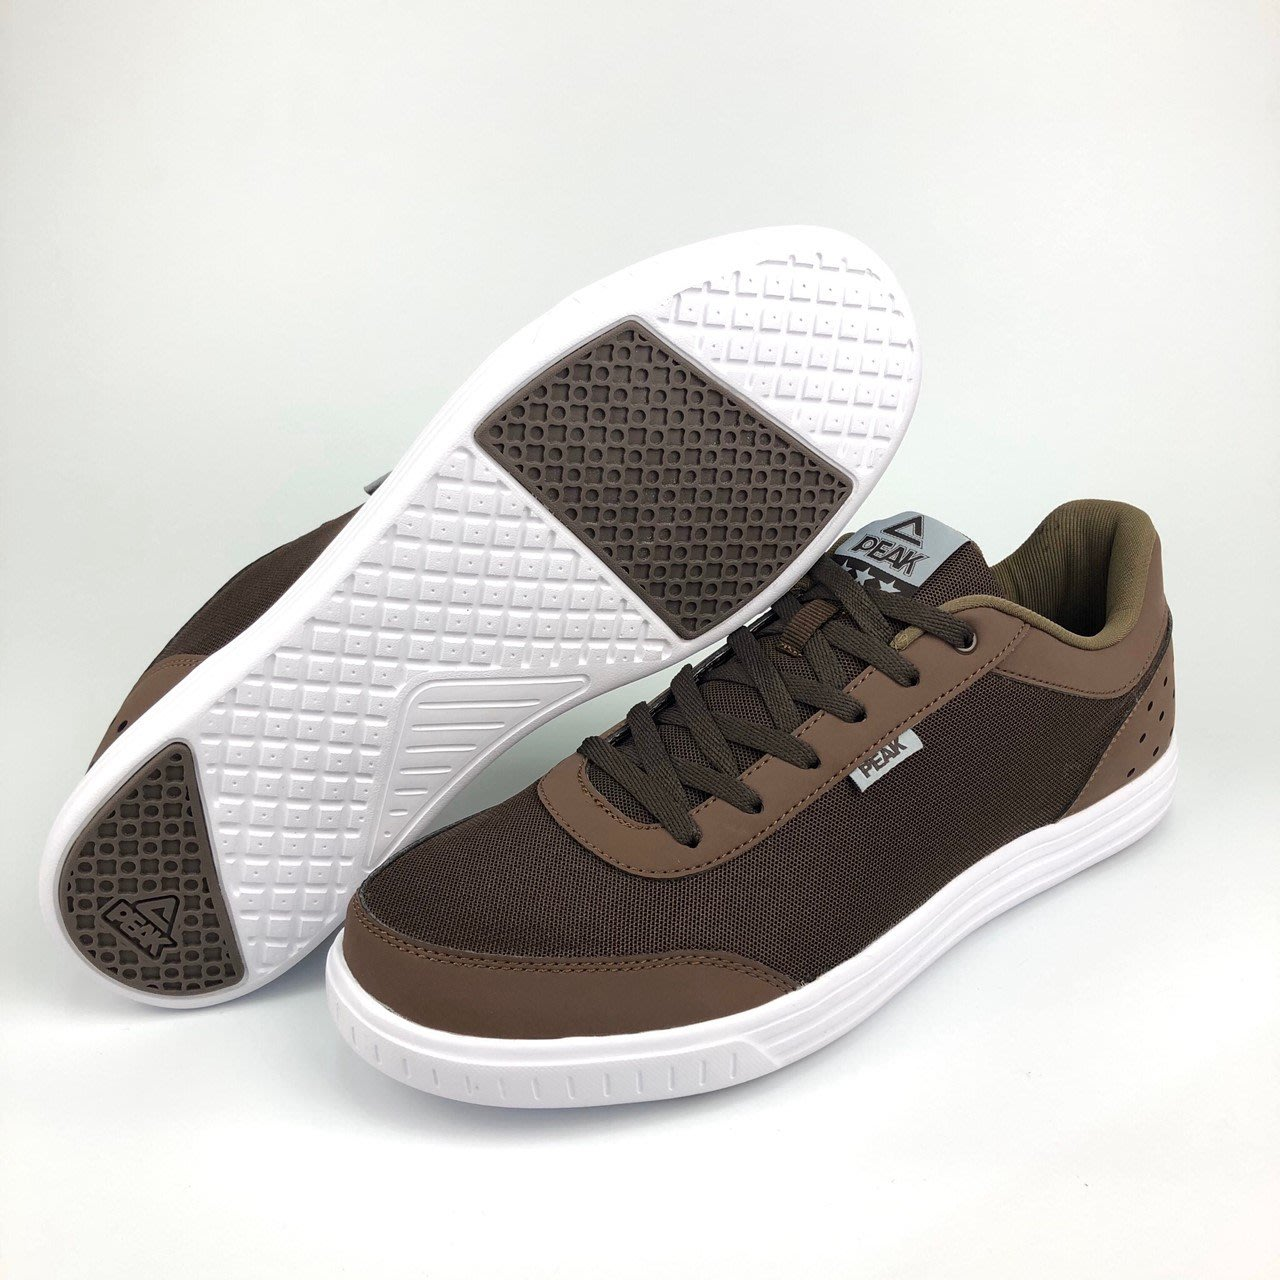 PEAK 休閒鞋 文化系列 男 E62147B 咖啡 I15 亮禹體育PEAK台灣經銷商